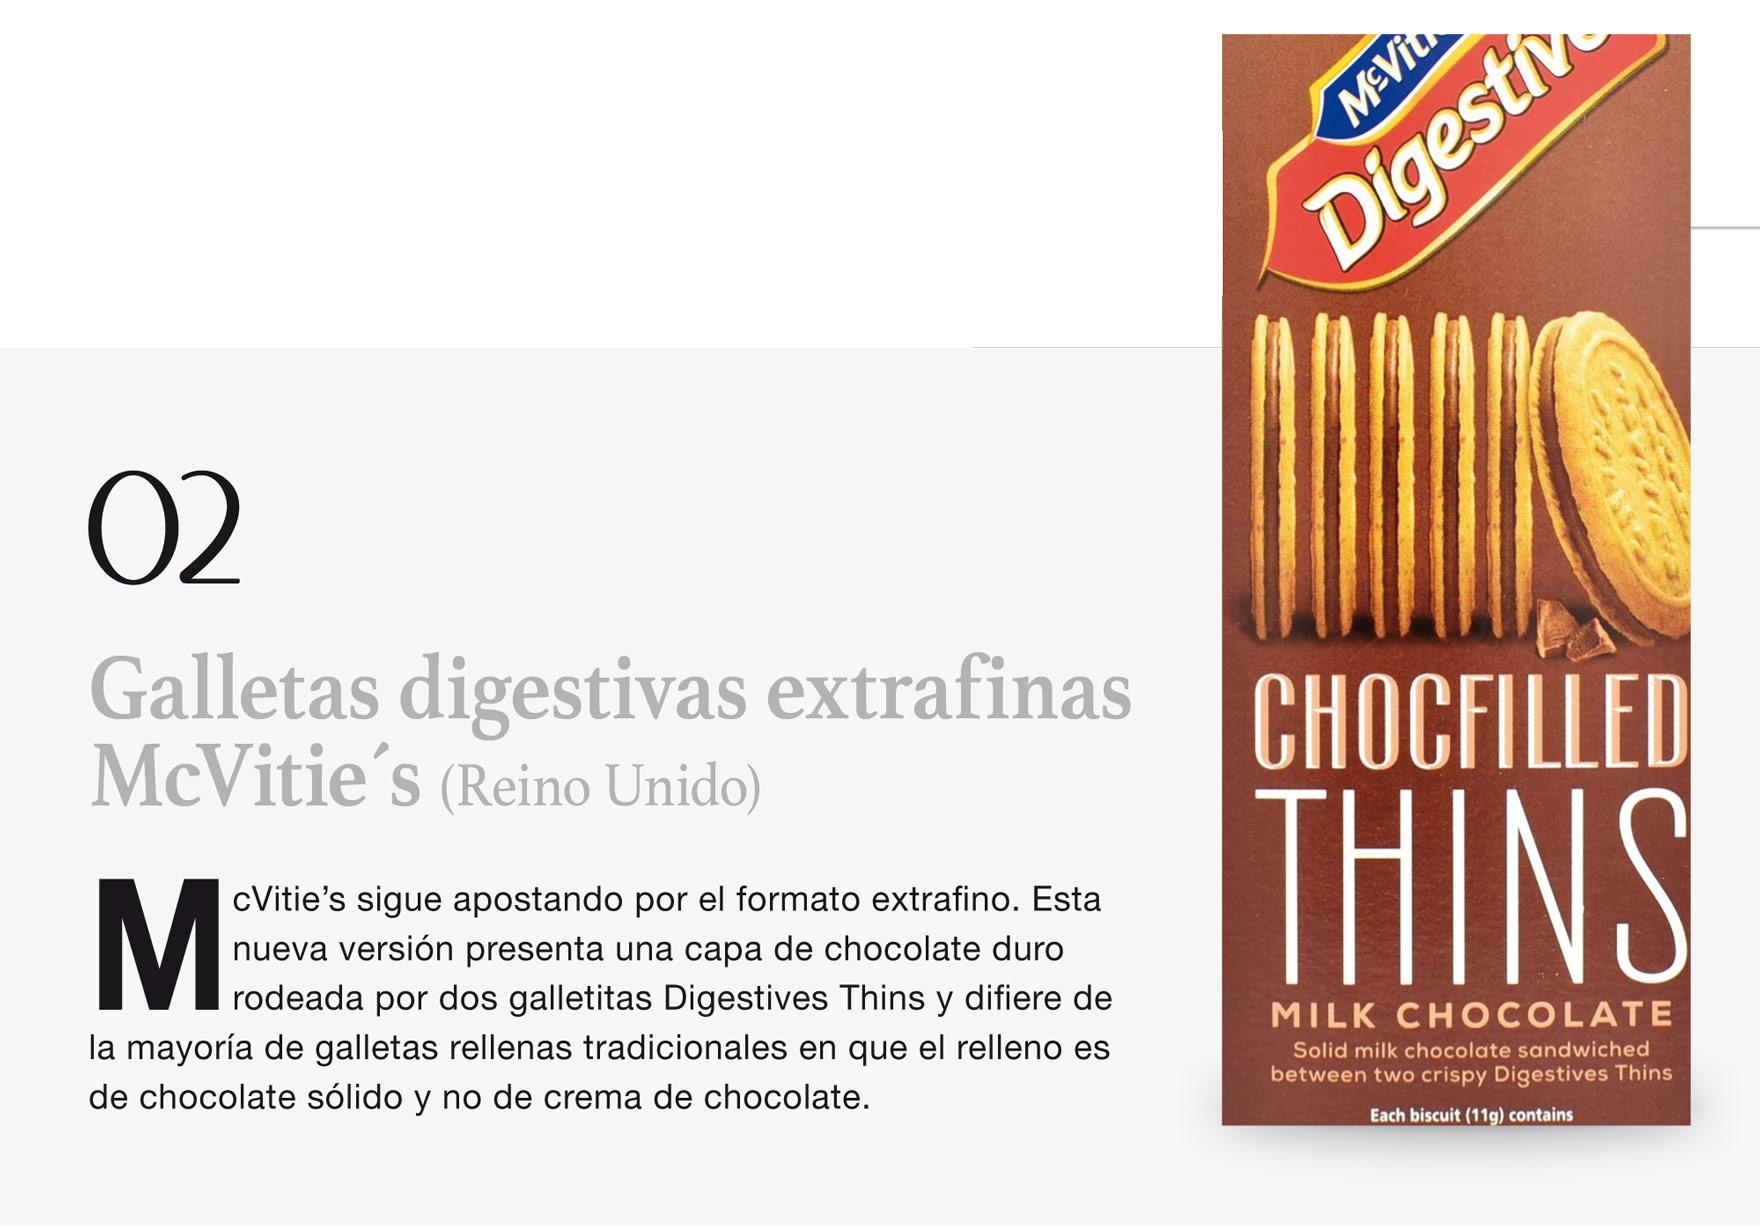 Galletas digestivas extrafinas McVitie´s